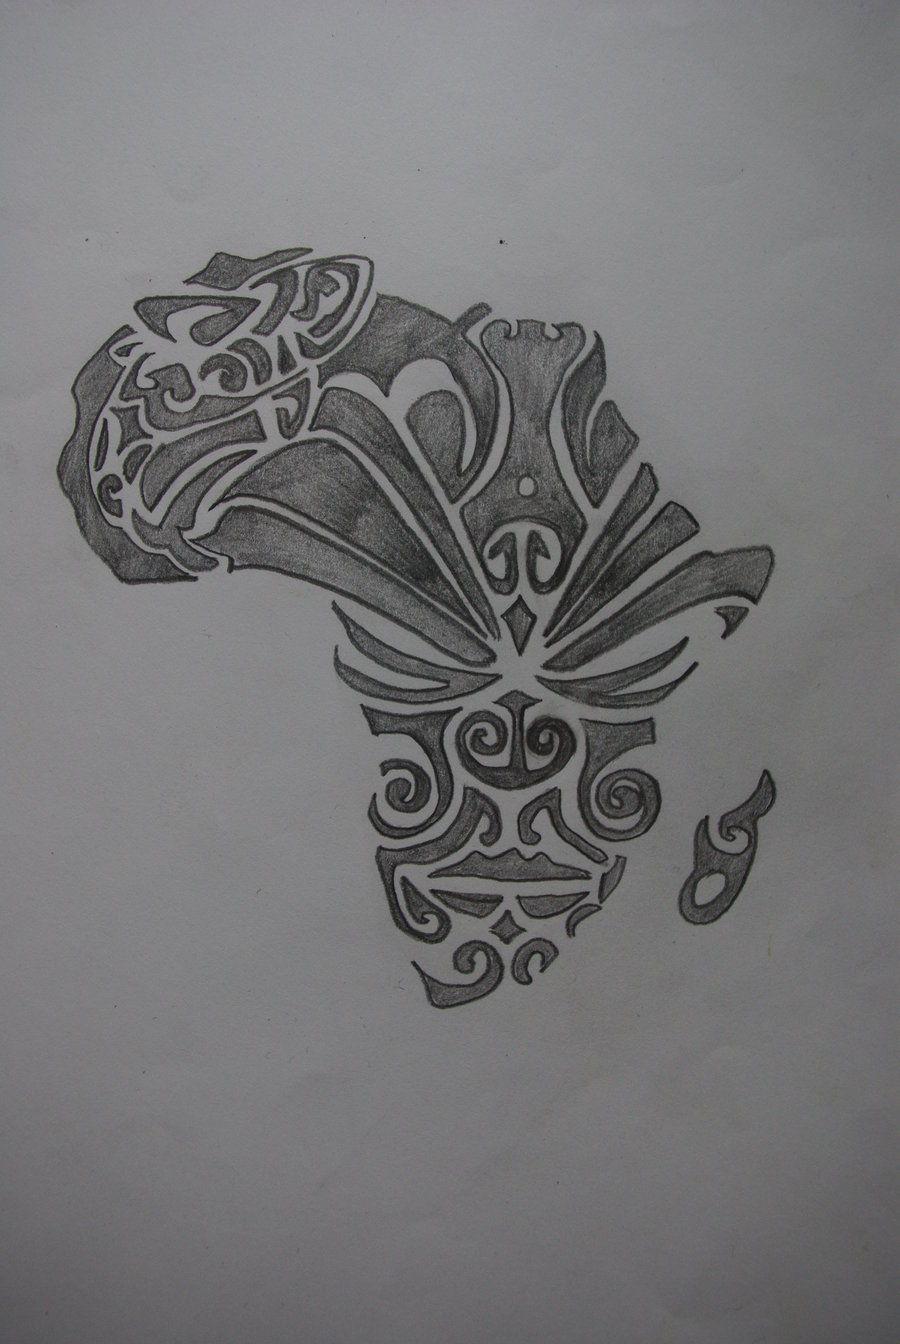 Maori Tattoo Love: Tattoo Design 2011 2012 Sinantattoo Africa Maori Love 1